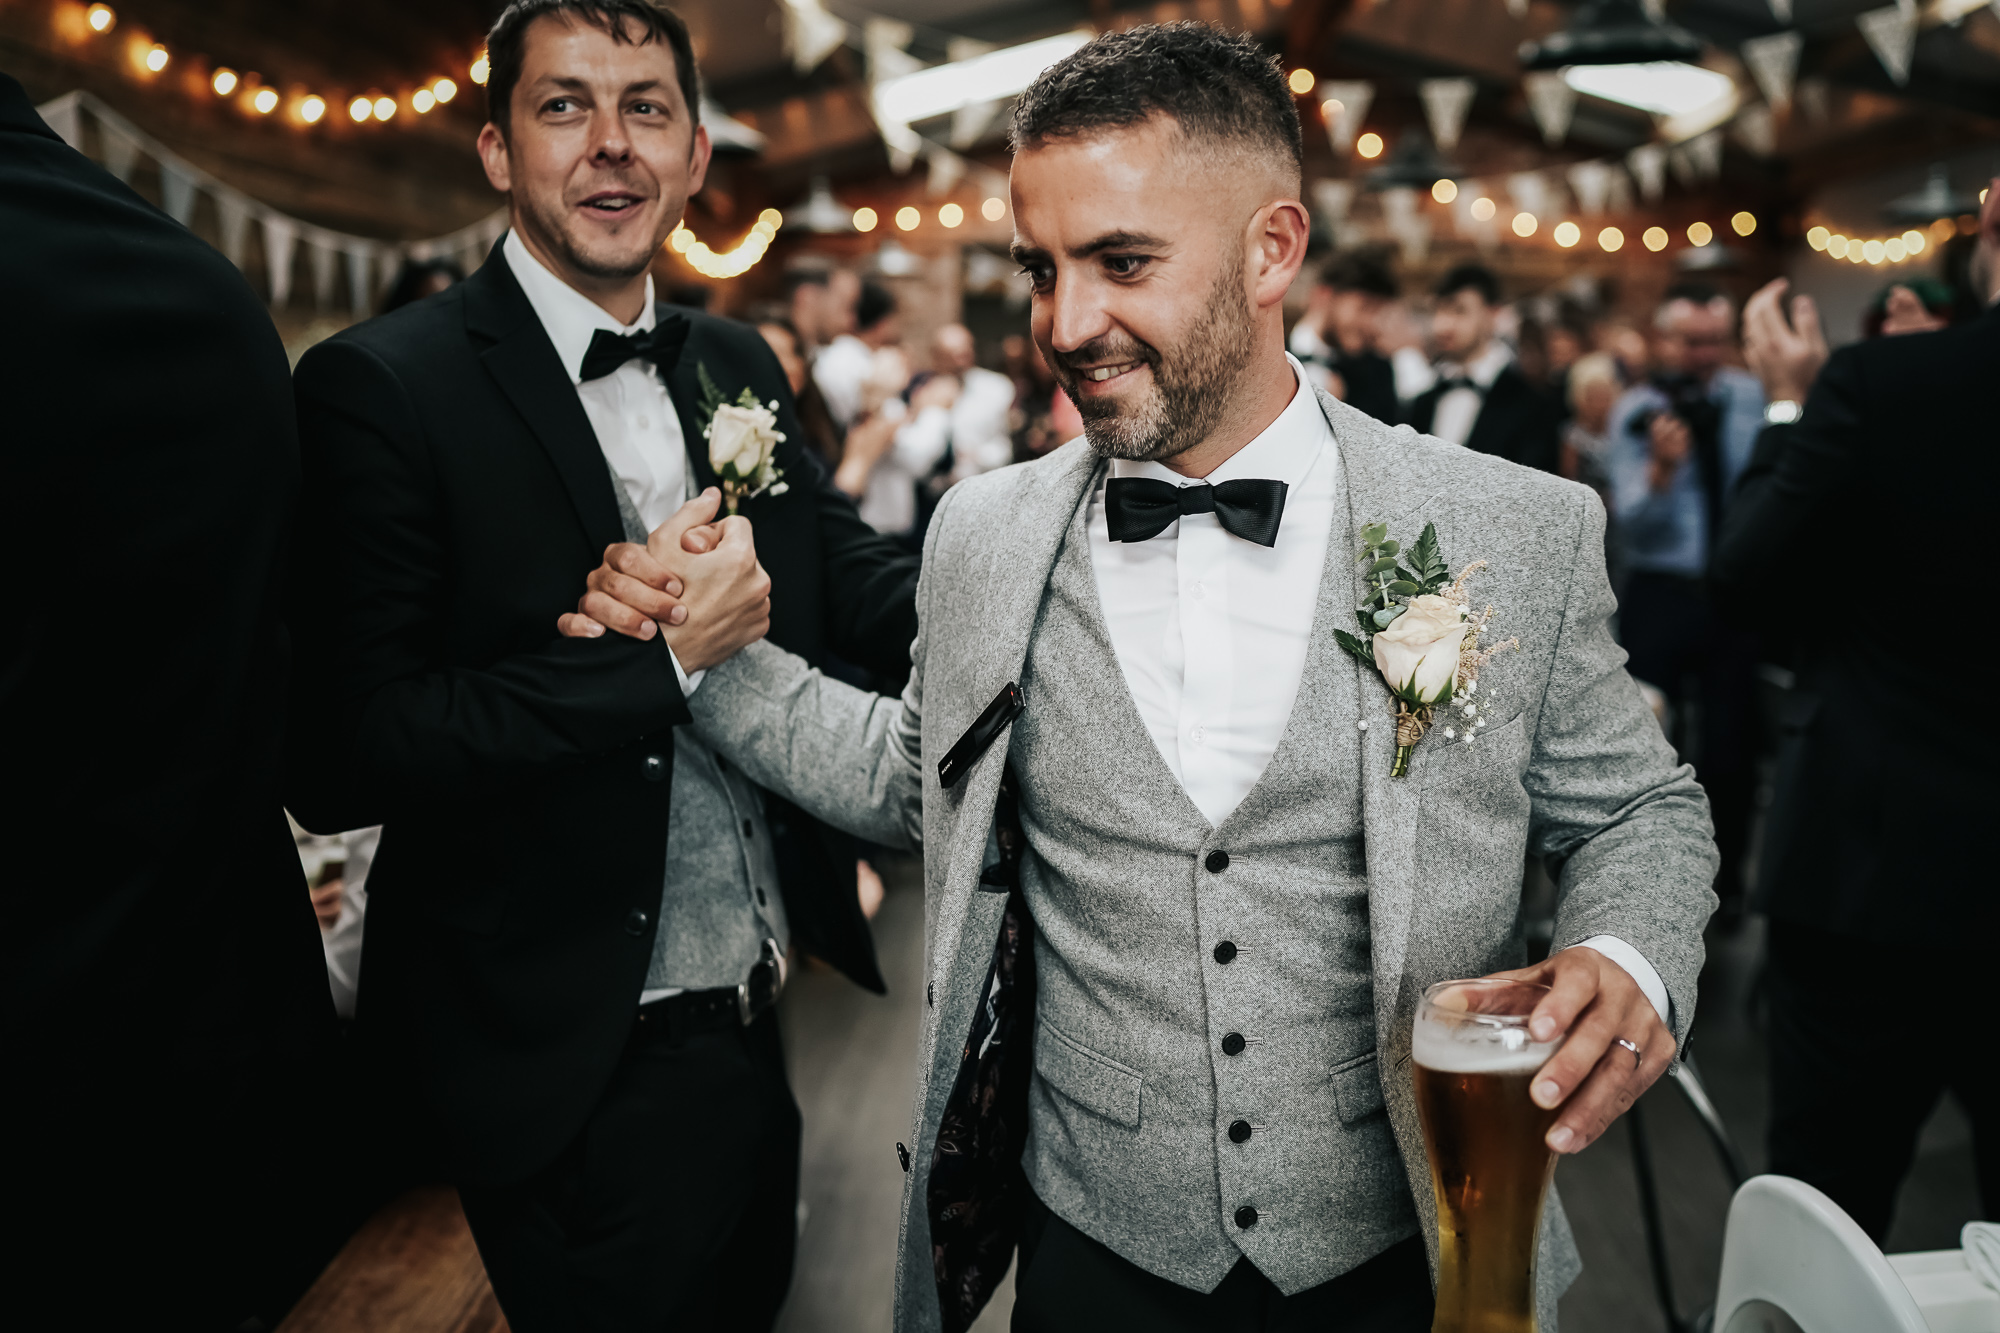 The Hayloft Wedding Photography Cheshire wedding photographer (41 of 52).jpg